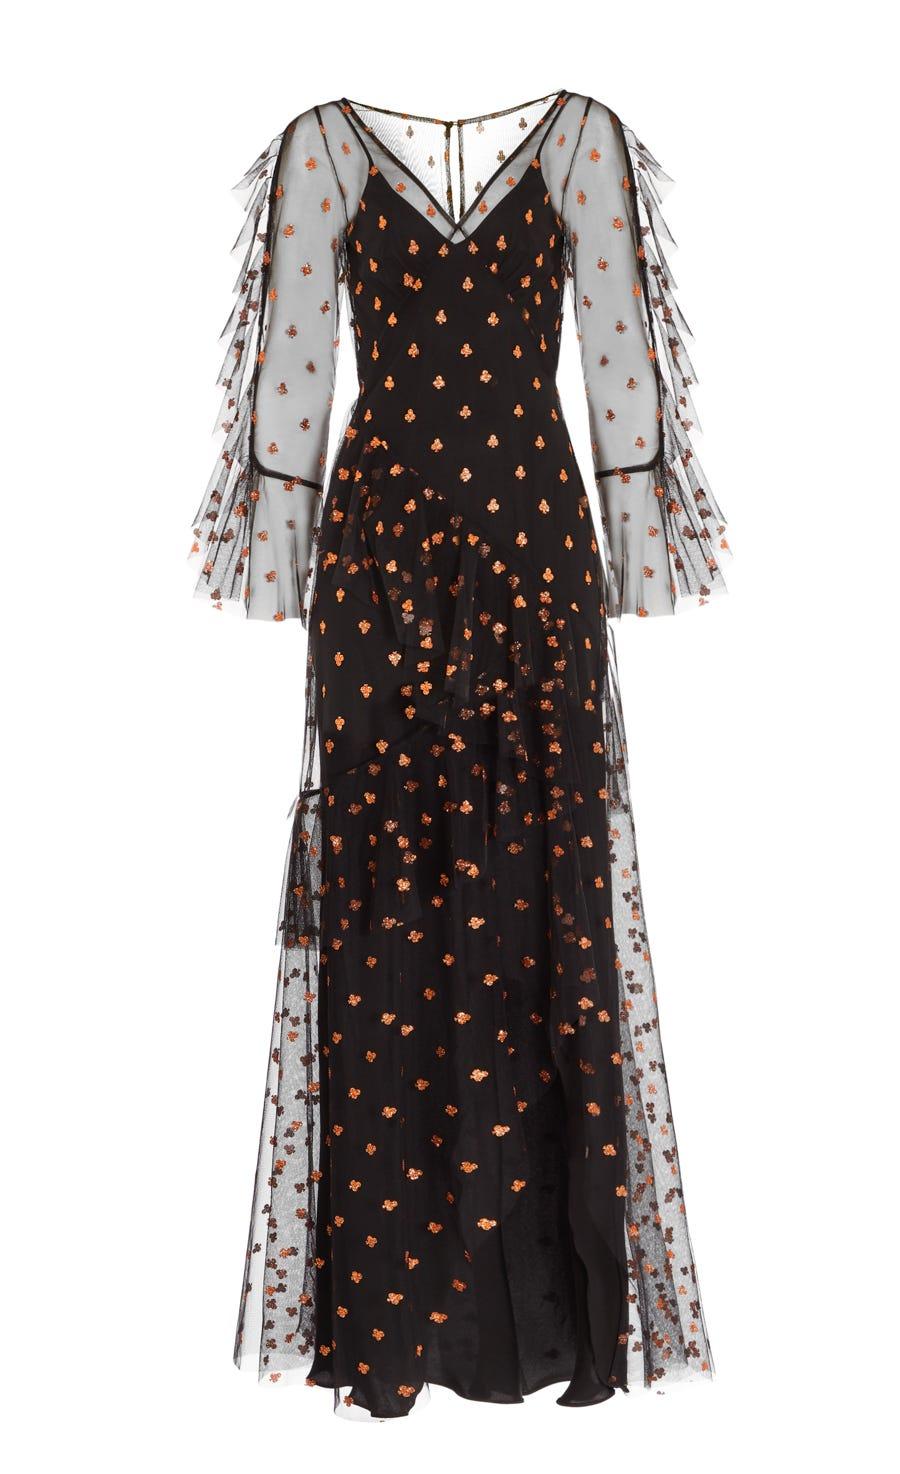 Fortuna Ruffle Dress